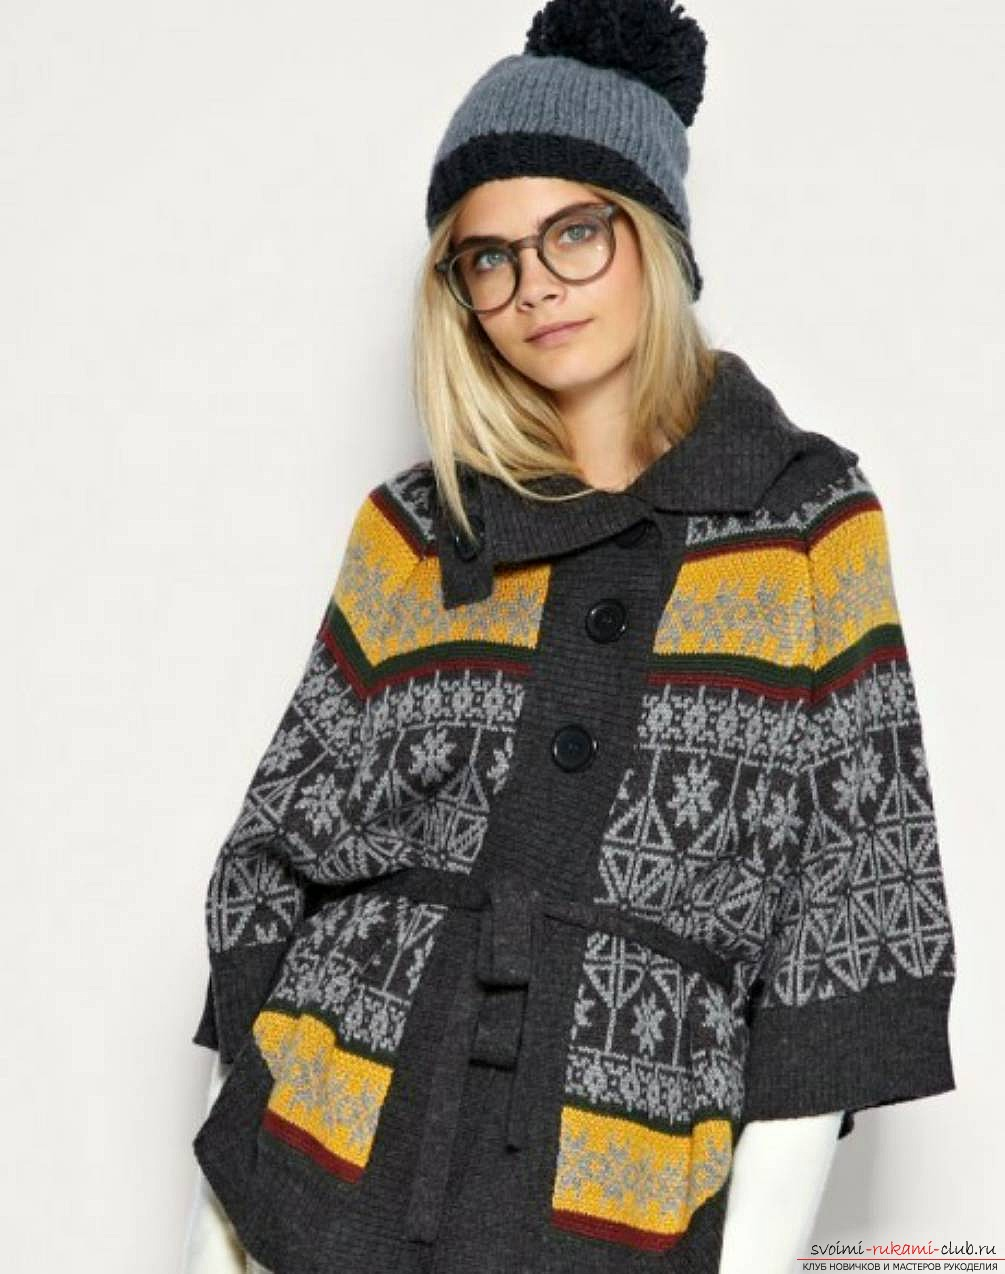 вязаный на спицах женский свитер с норвежским узором. Фото №6